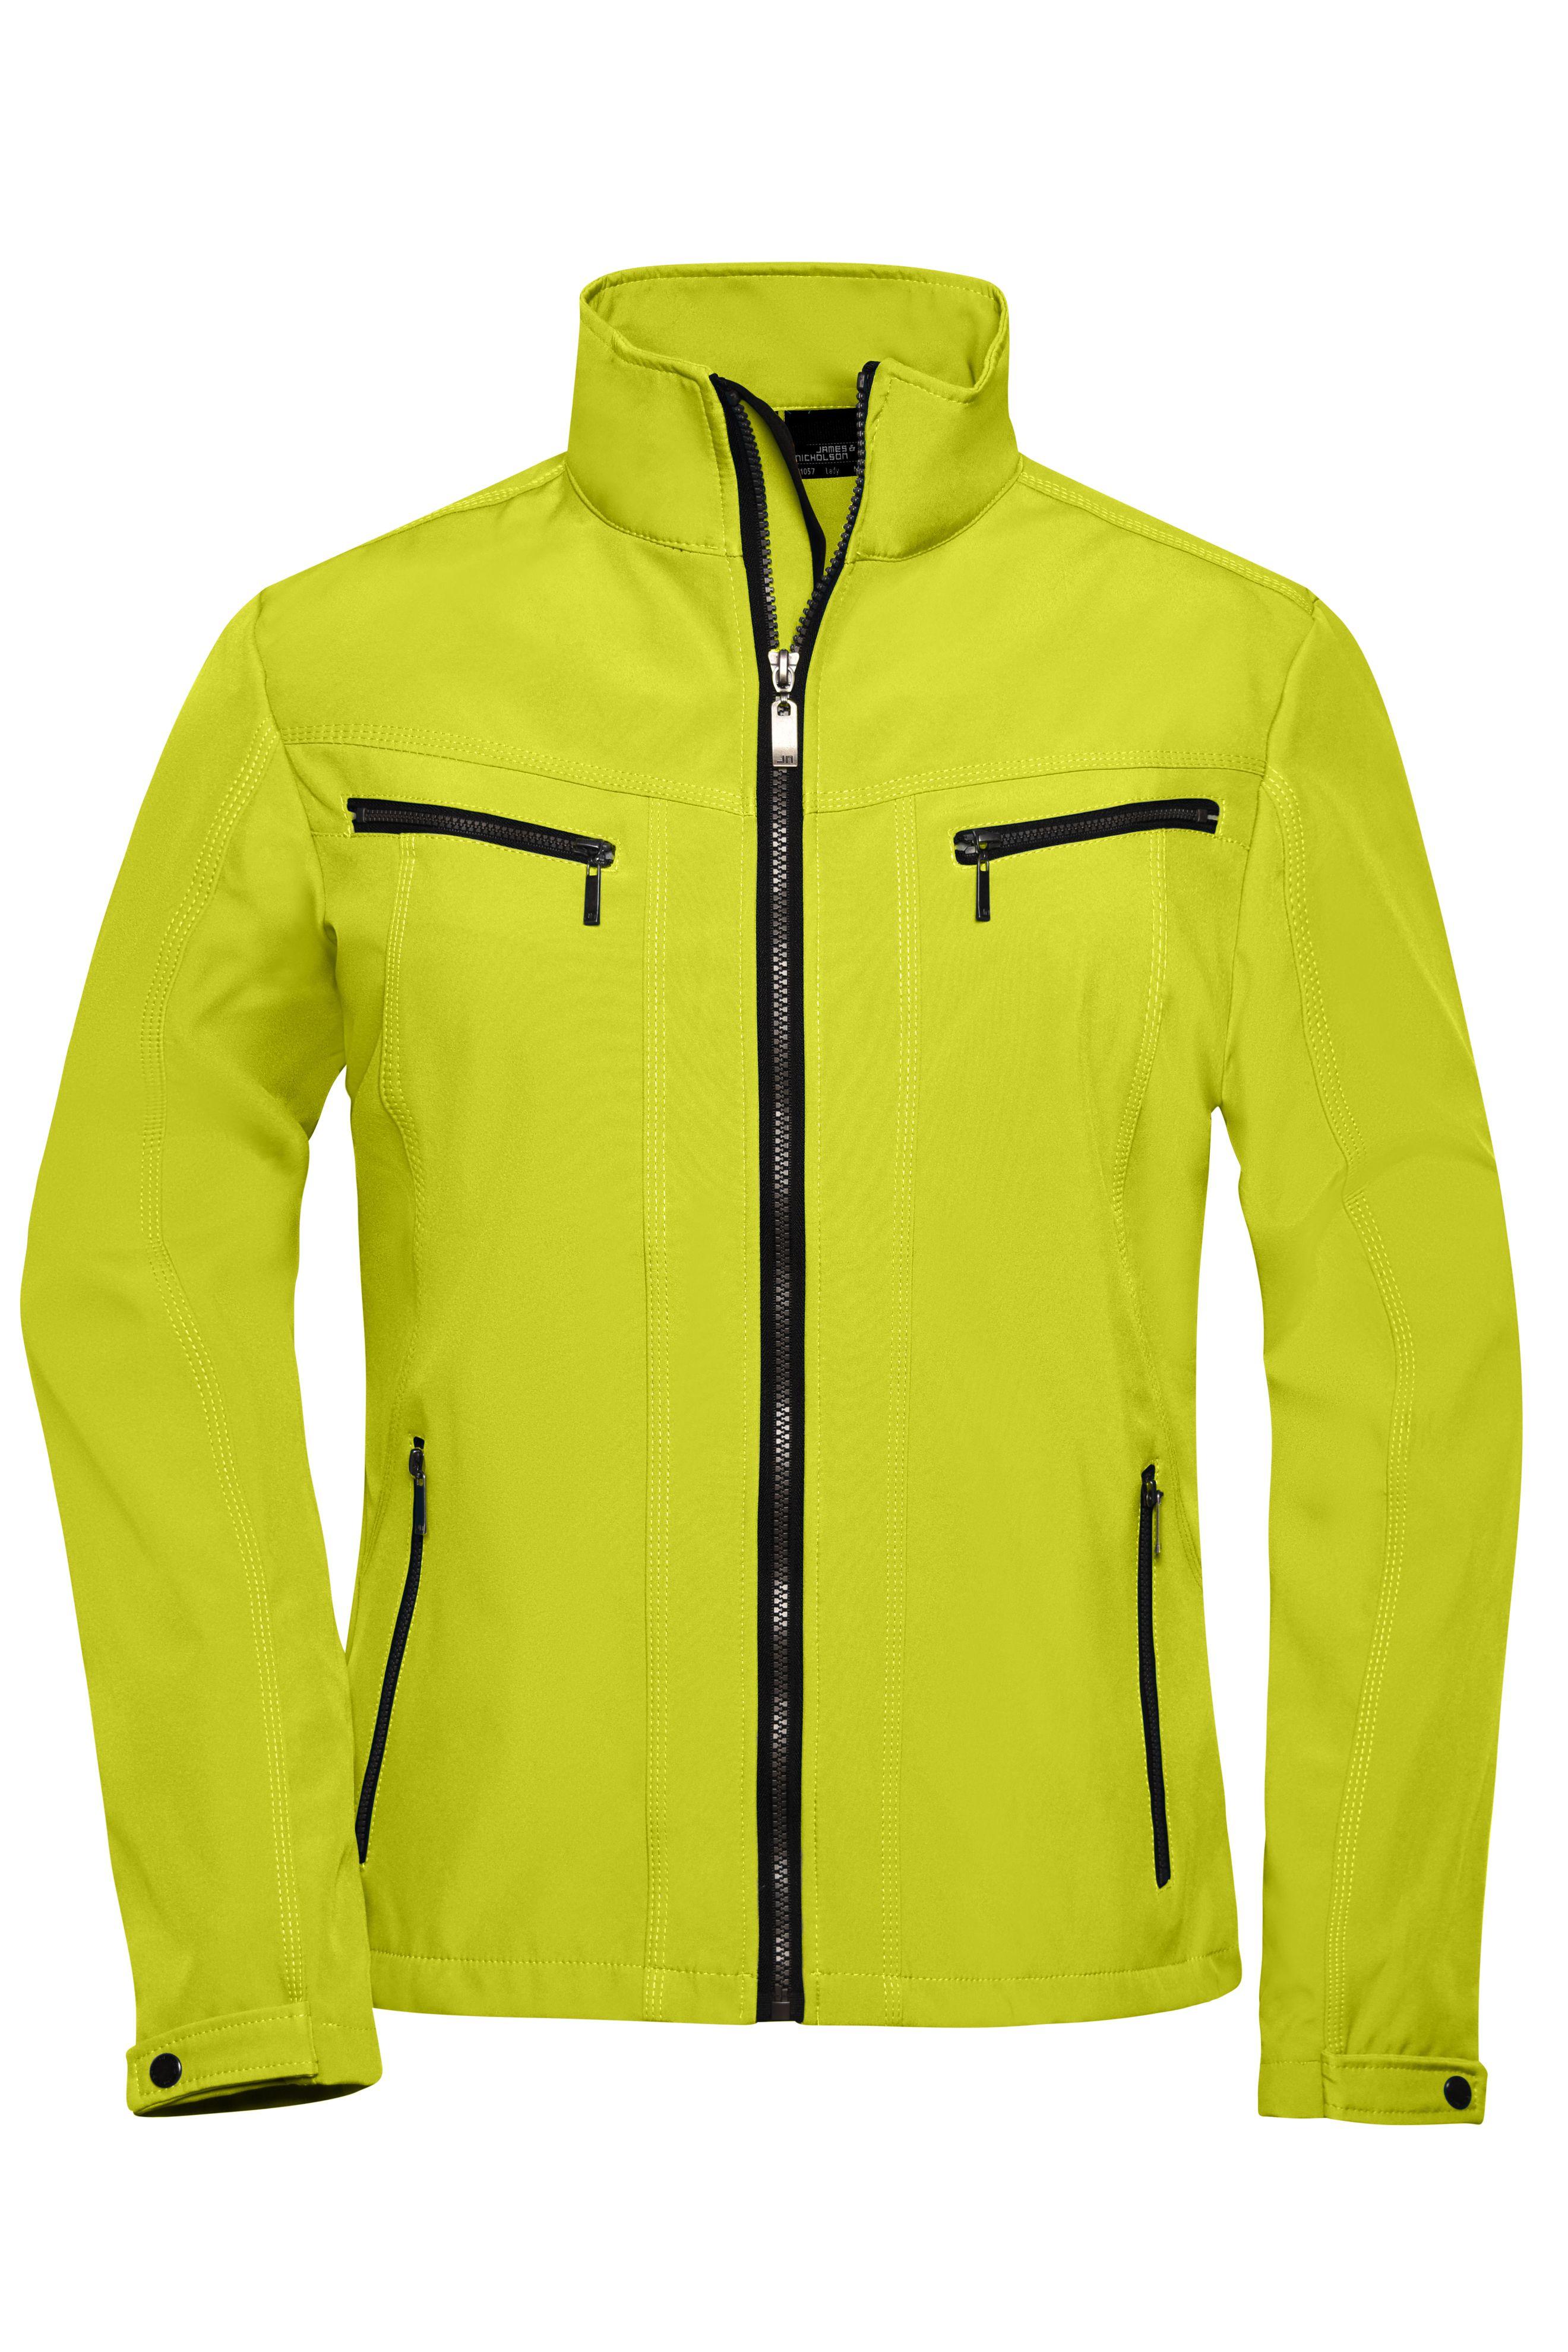 Trendige Jacke in neuem Design